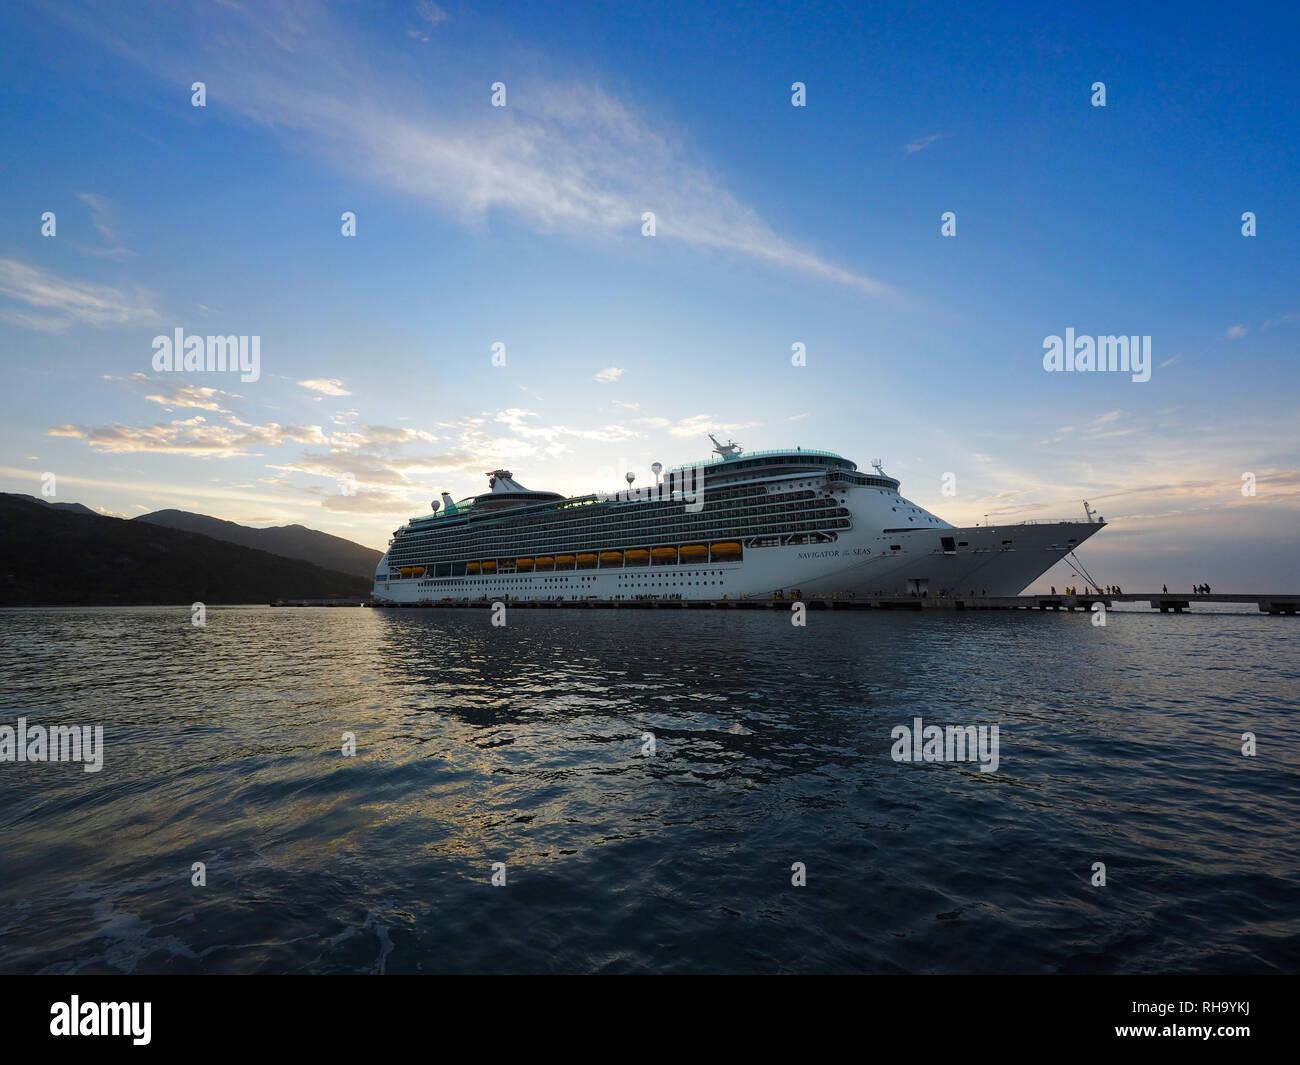 Royal Caribbeans cruise ship at Haiti, Caribbeans - Stock Image